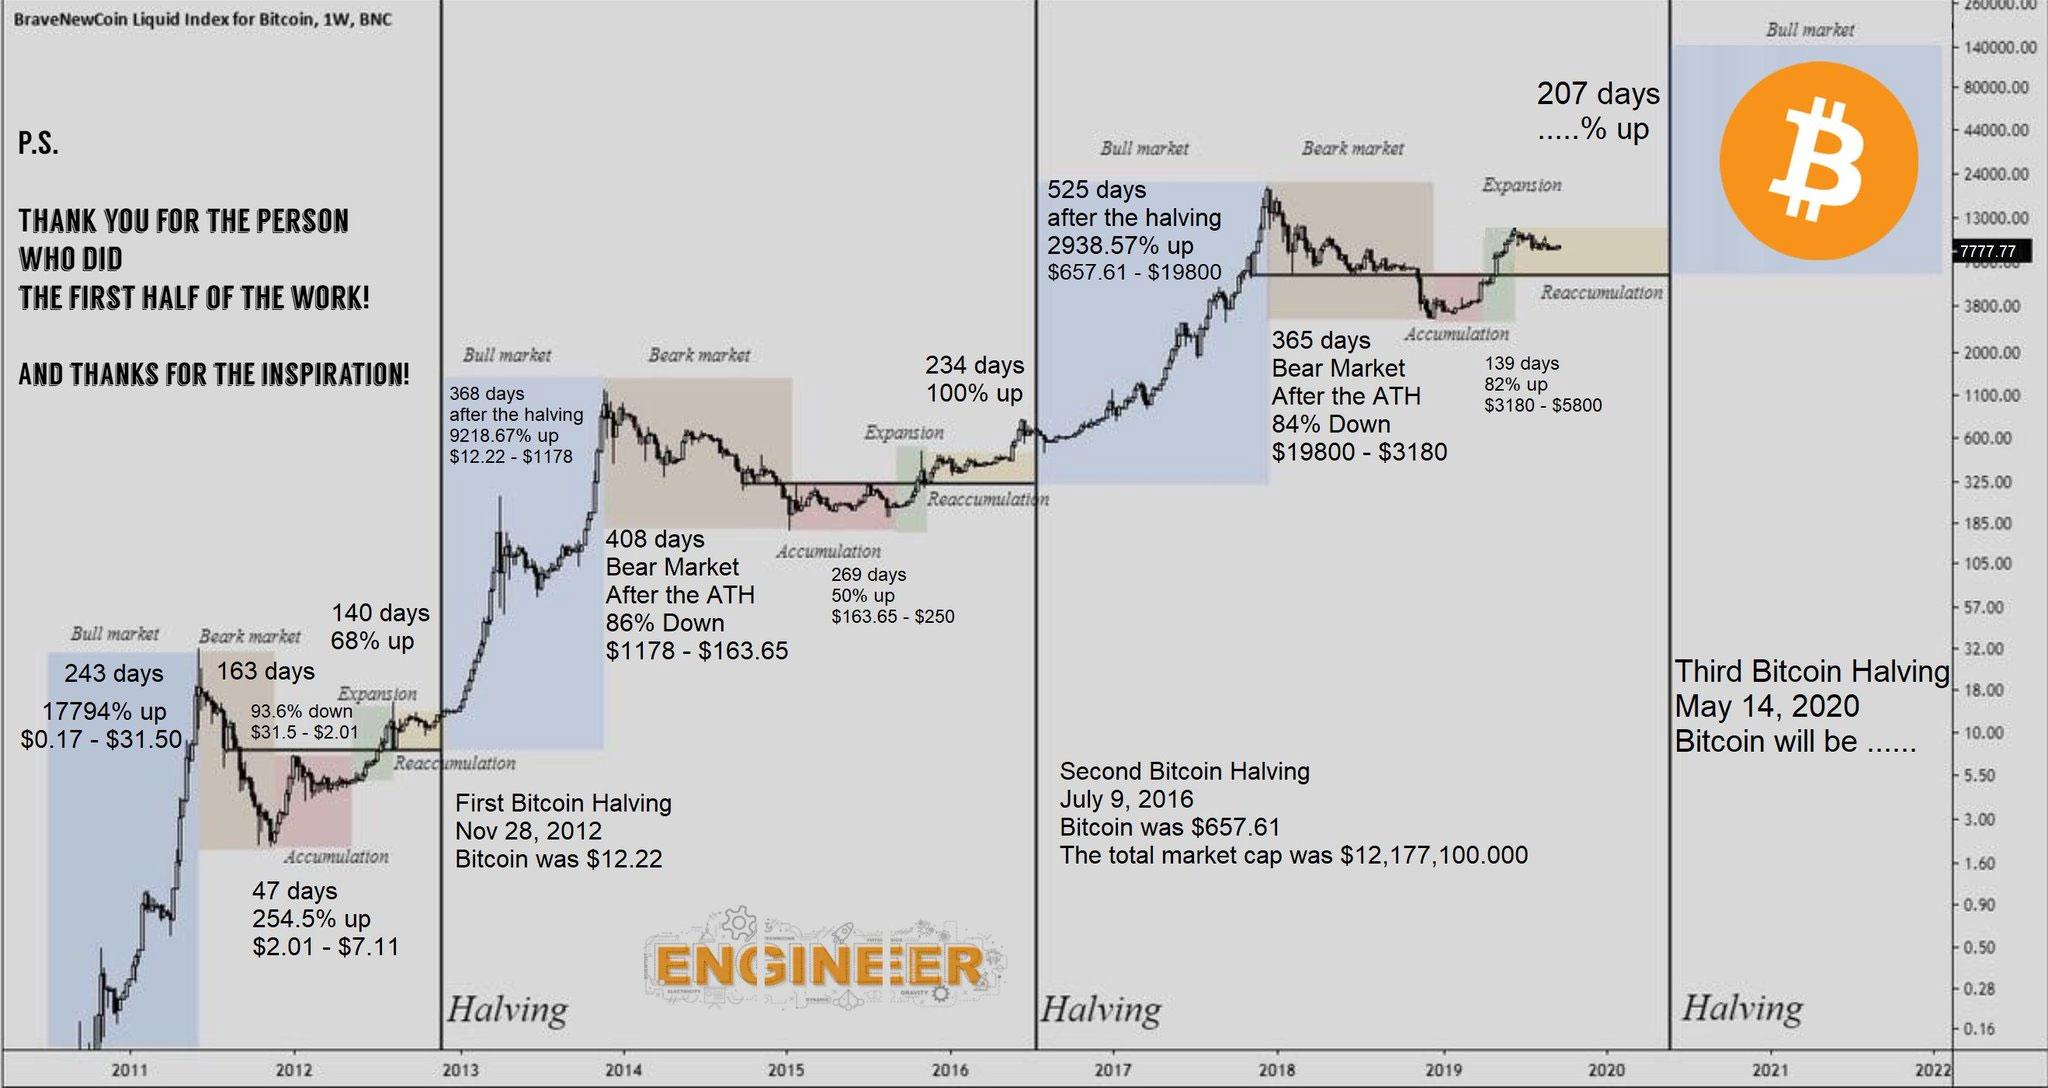 Bitcoins per block charting